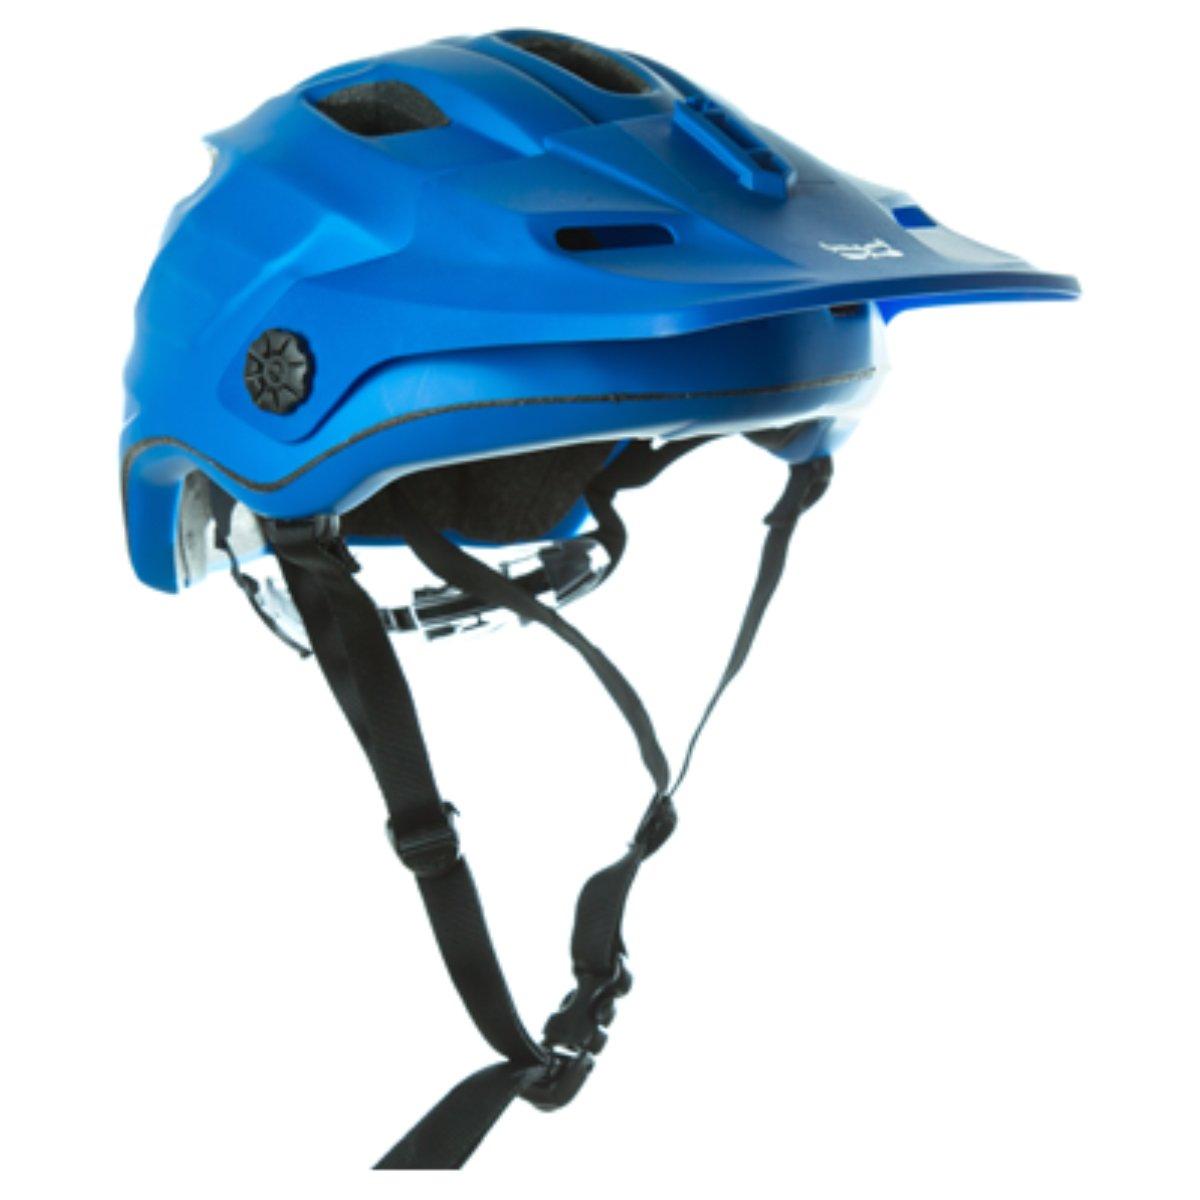 the best enduro helmets reviews 2018 best helmet. Black Bedroom Furniture Sets. Home Design Ideas